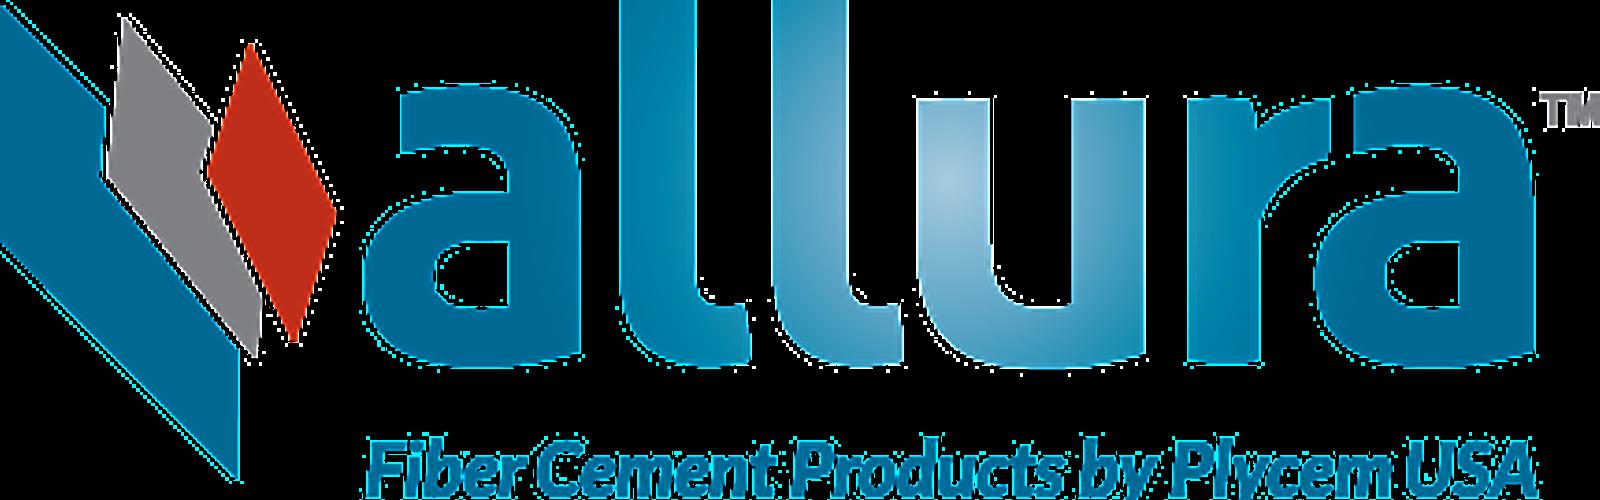 Allura logo FCP by Plycem 20copy